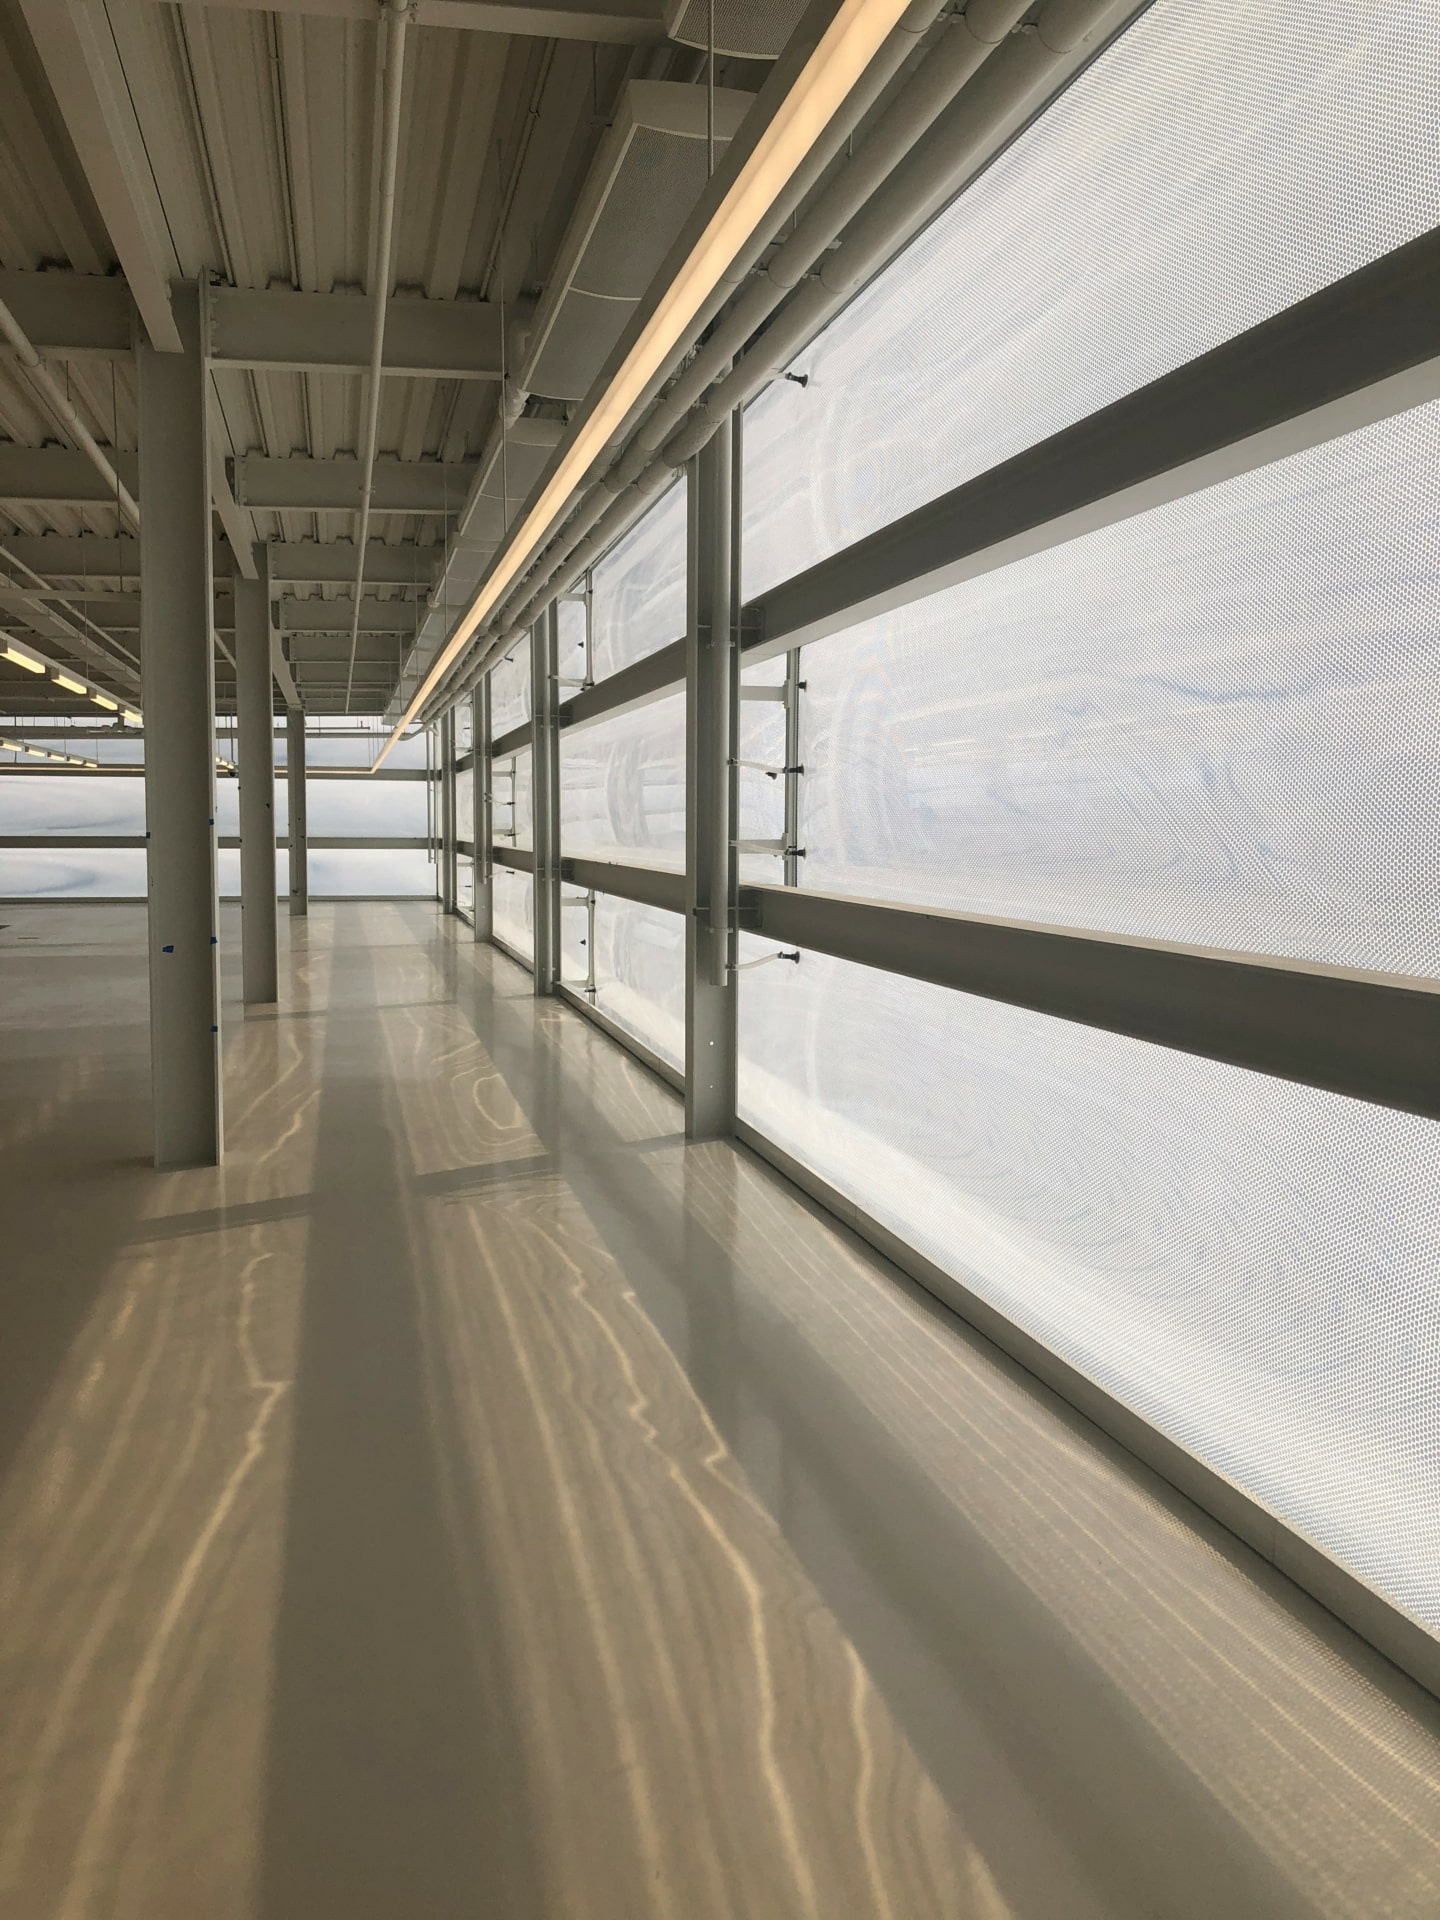 Innenbeleuchtung durch die innovative Texlon® ETFE-Fassade.